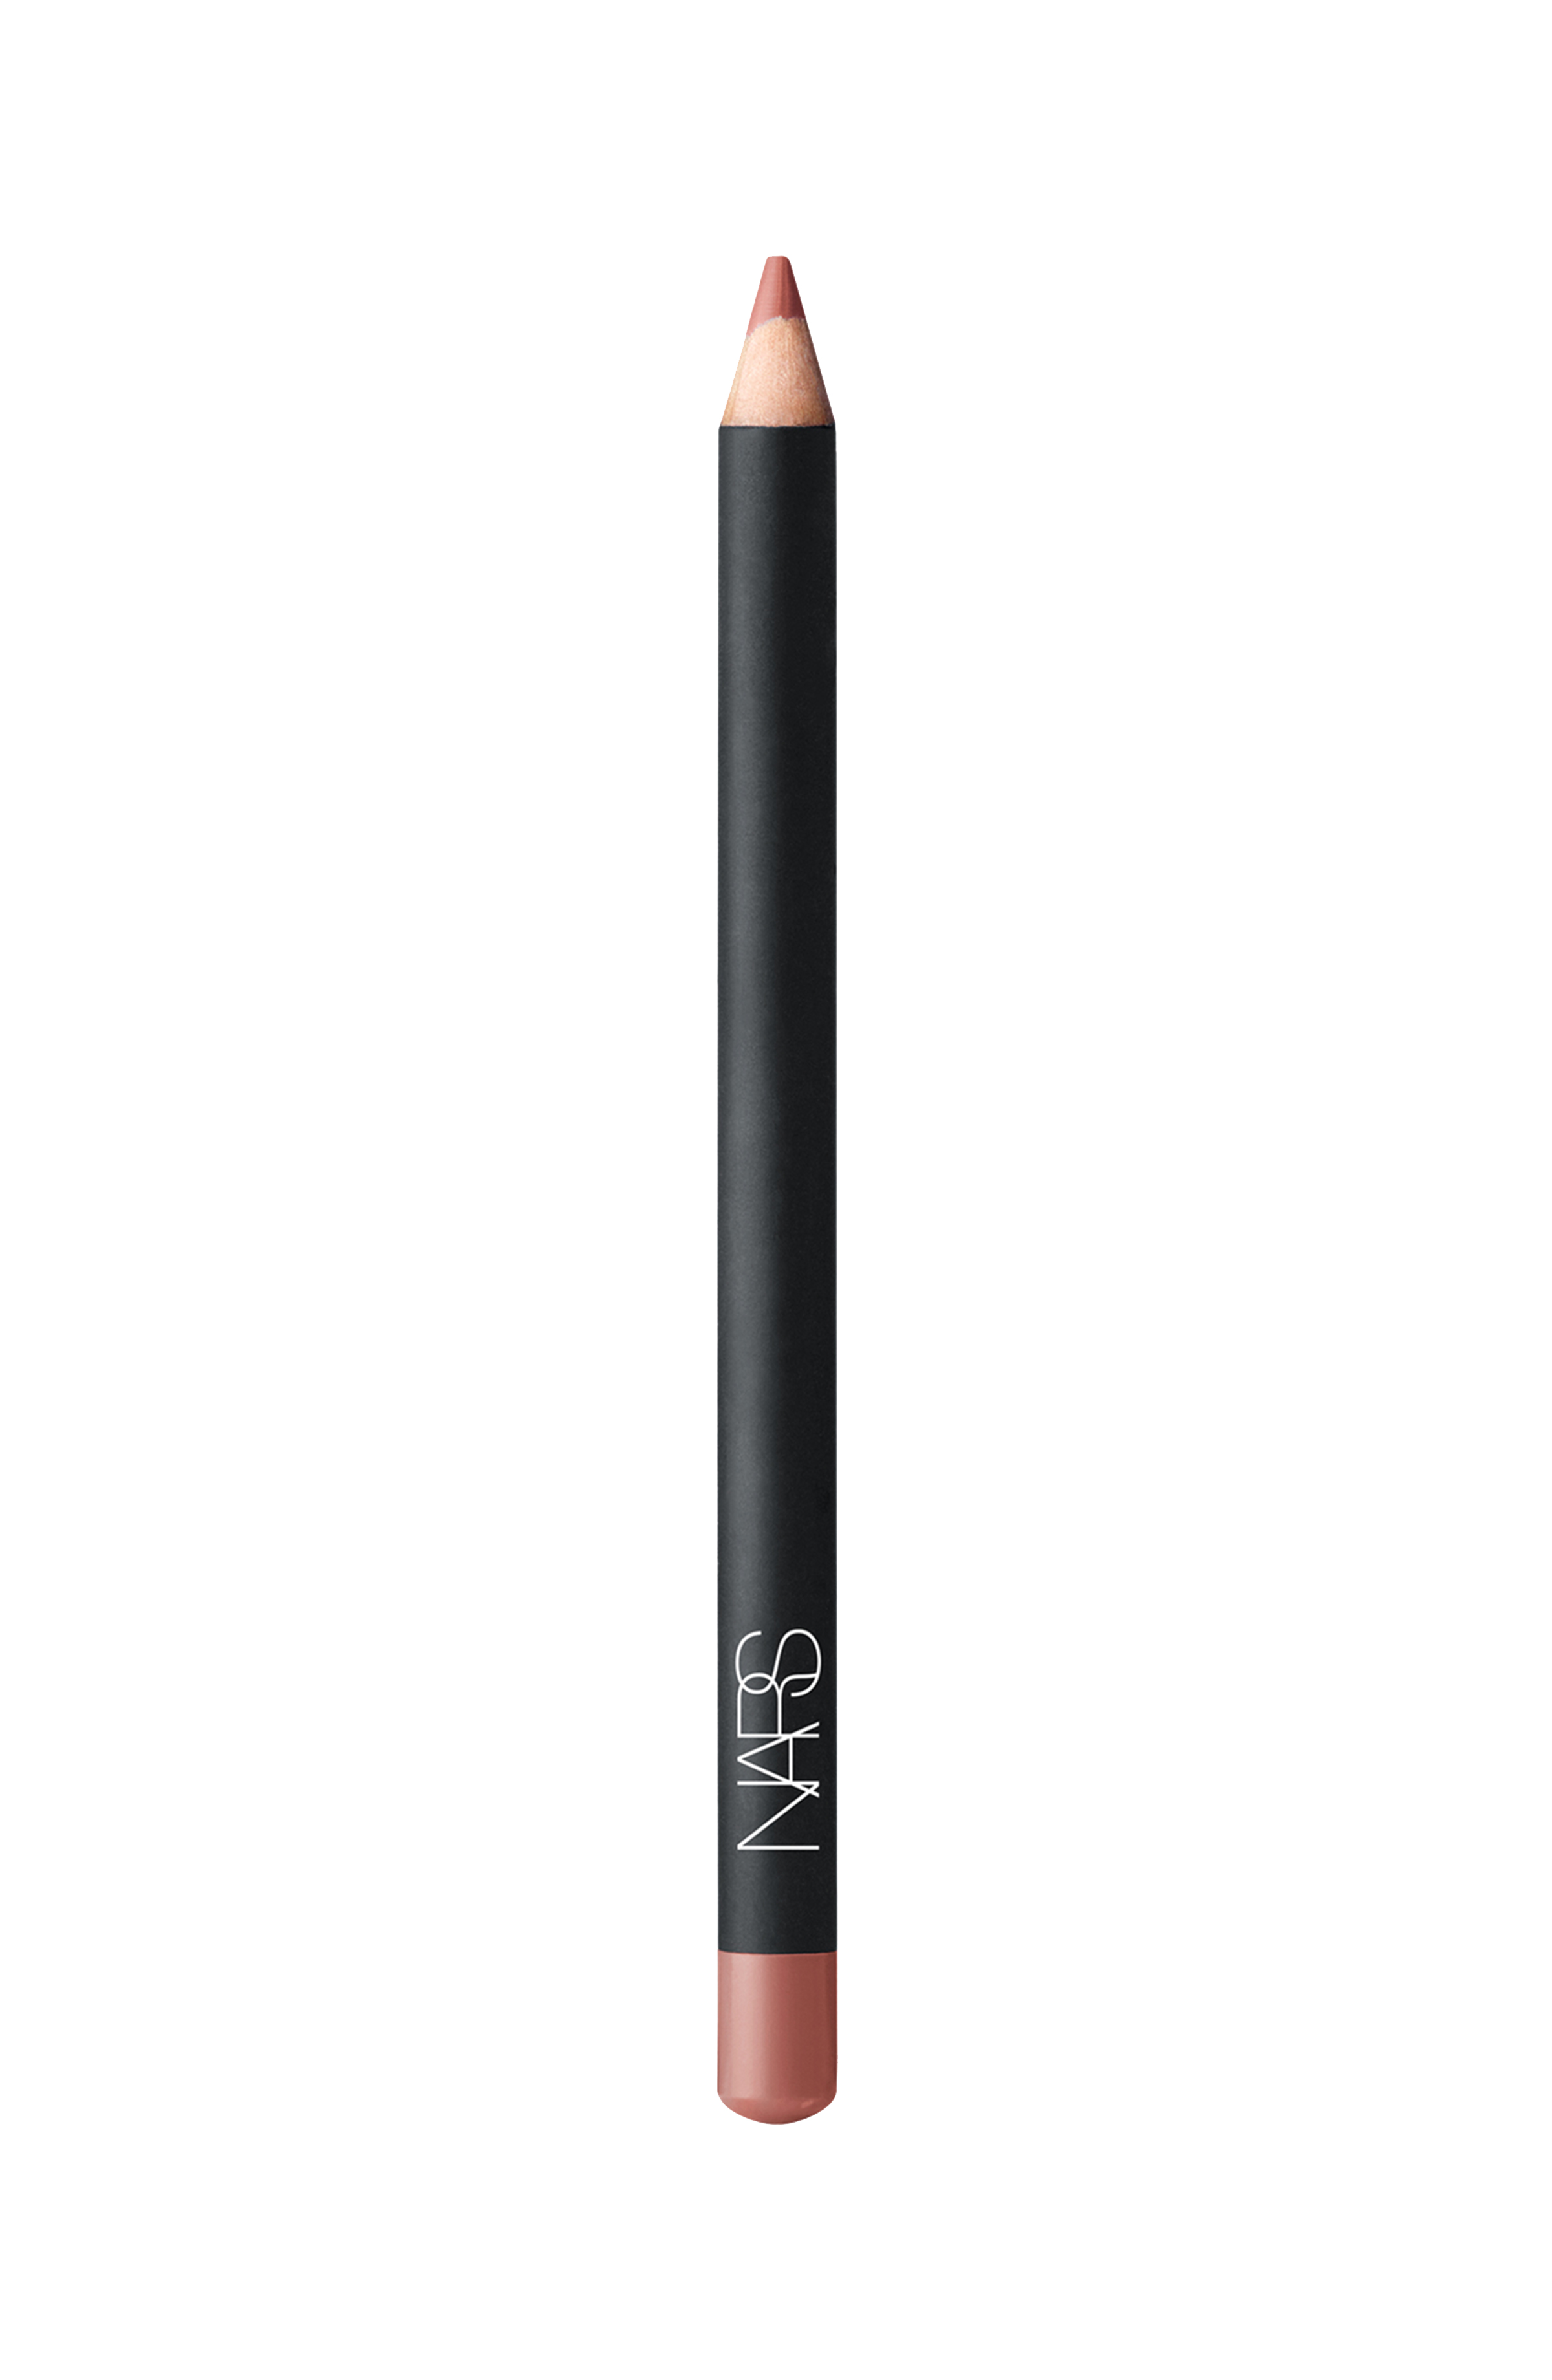 Precision Lip Liner Halong Bay